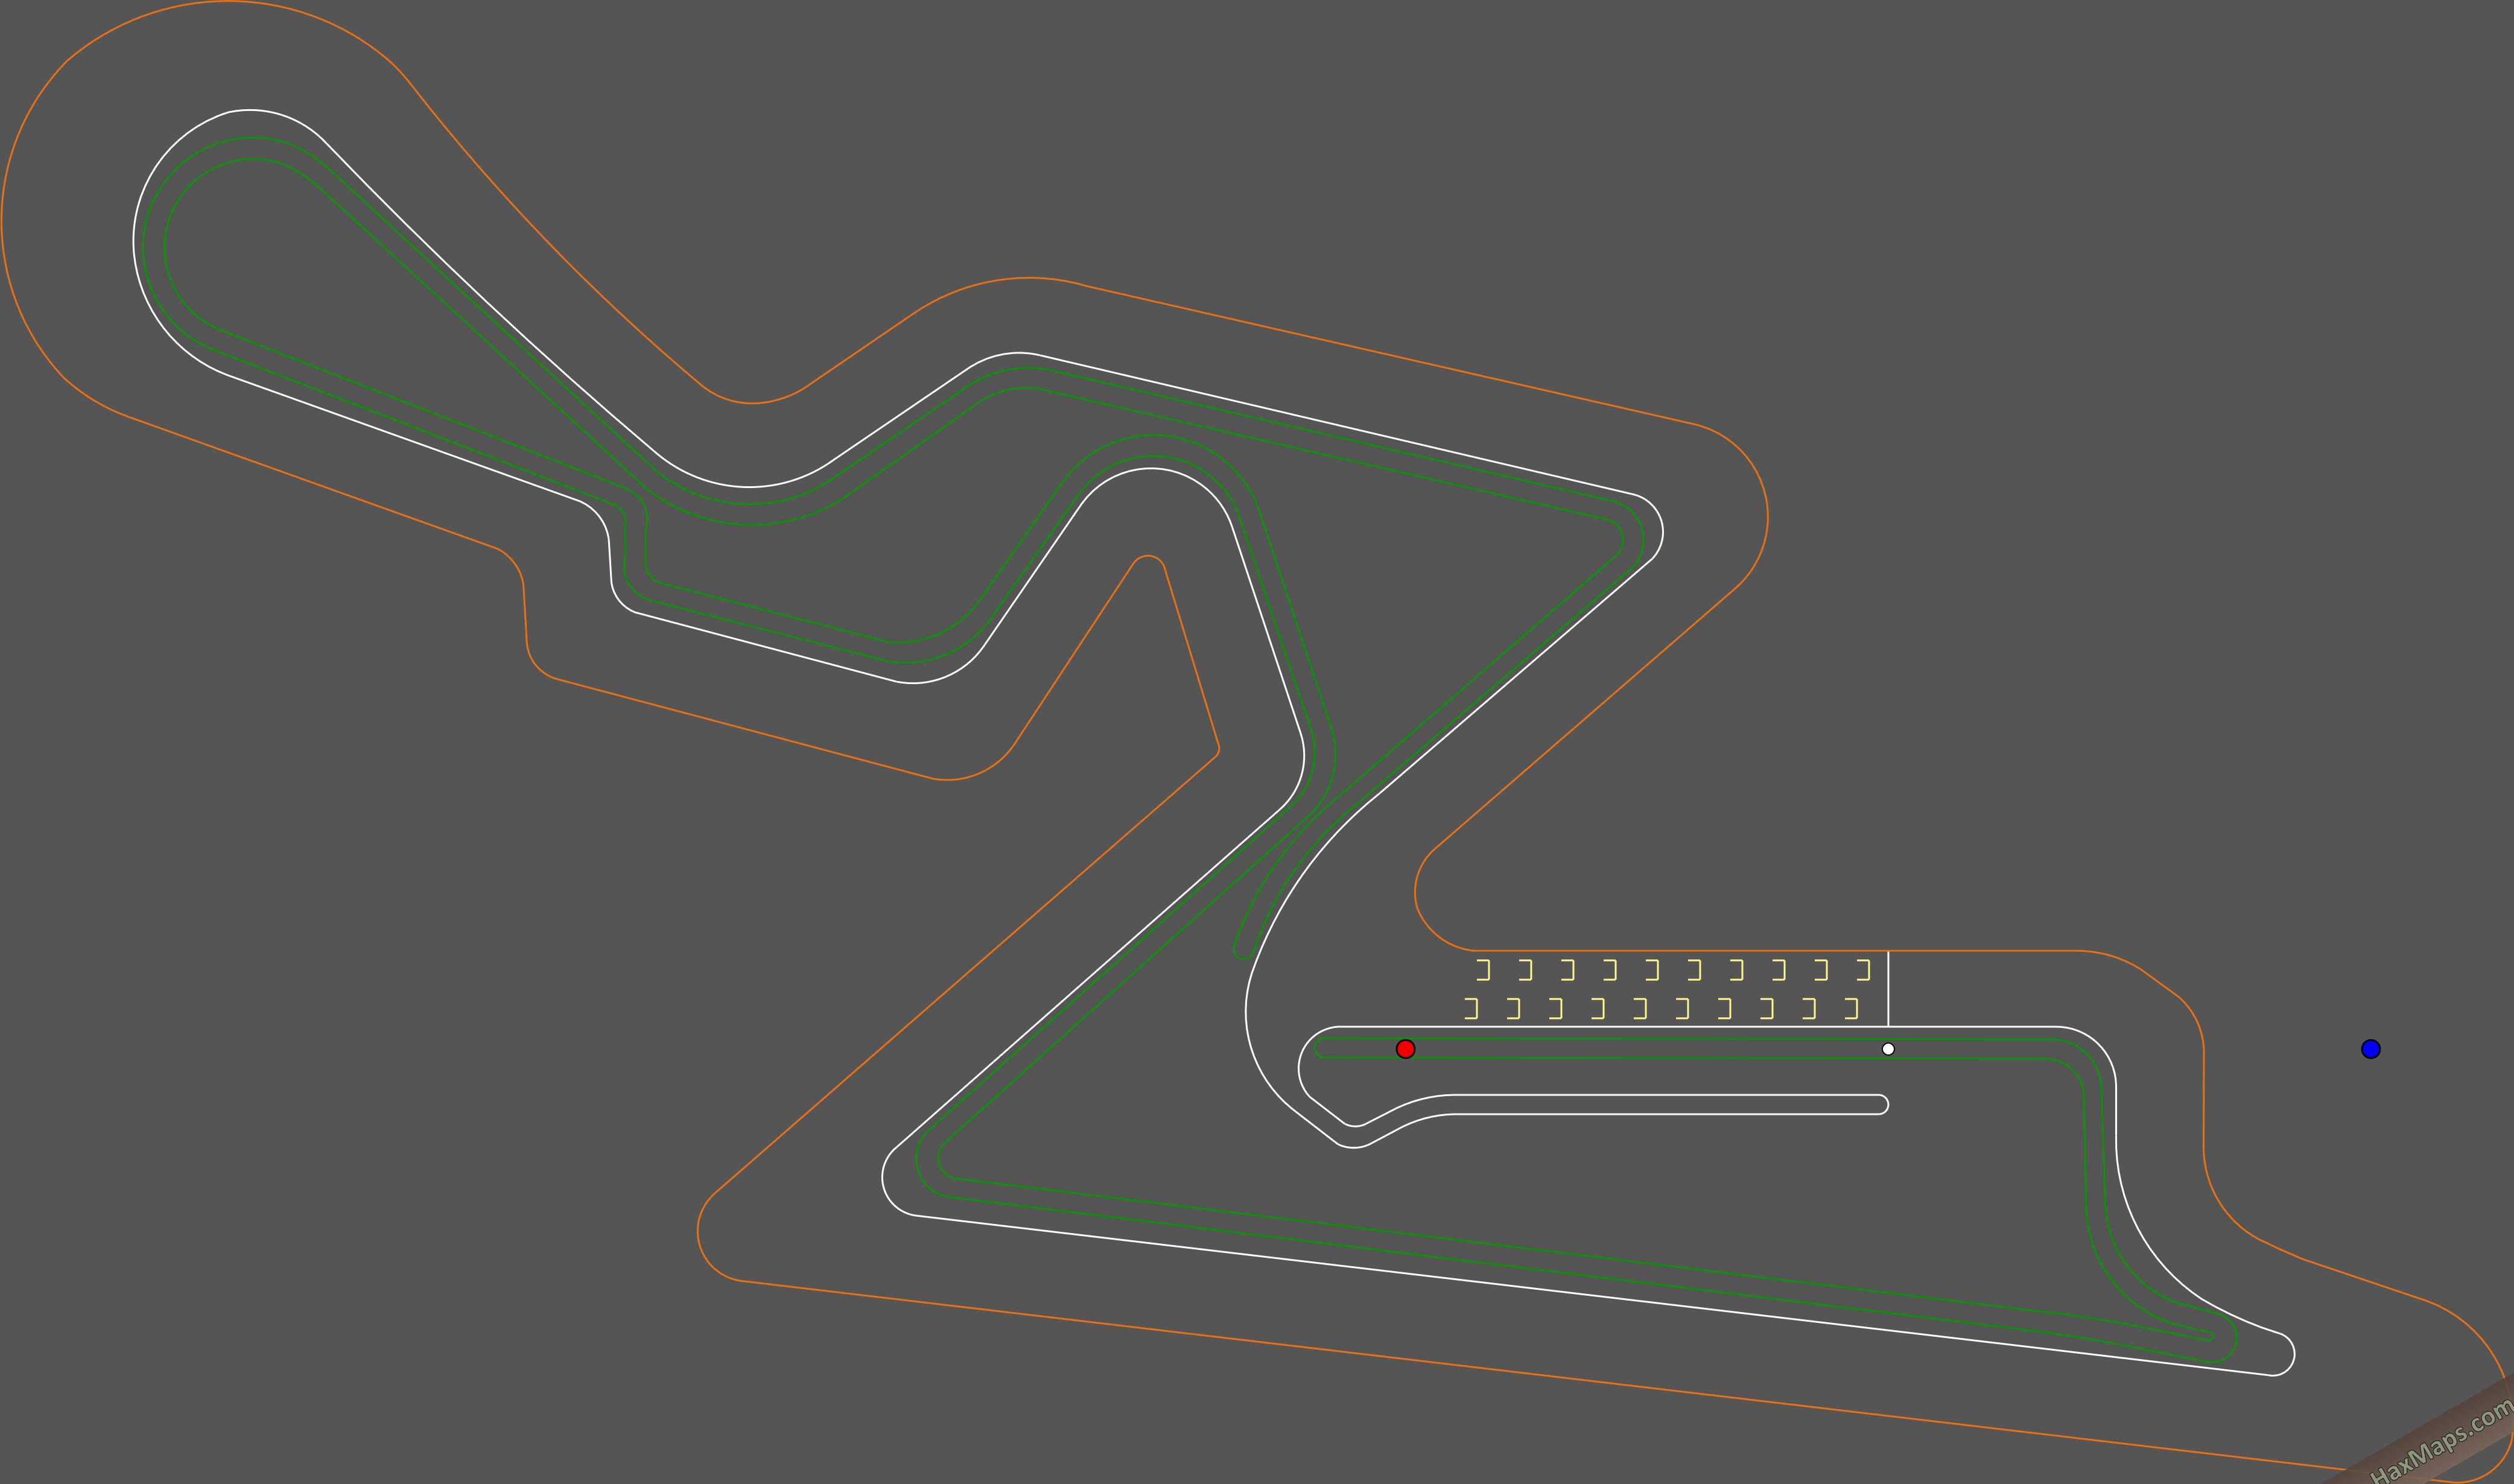 hax ball maps | F1 Indian Grand Prix by POPkORN